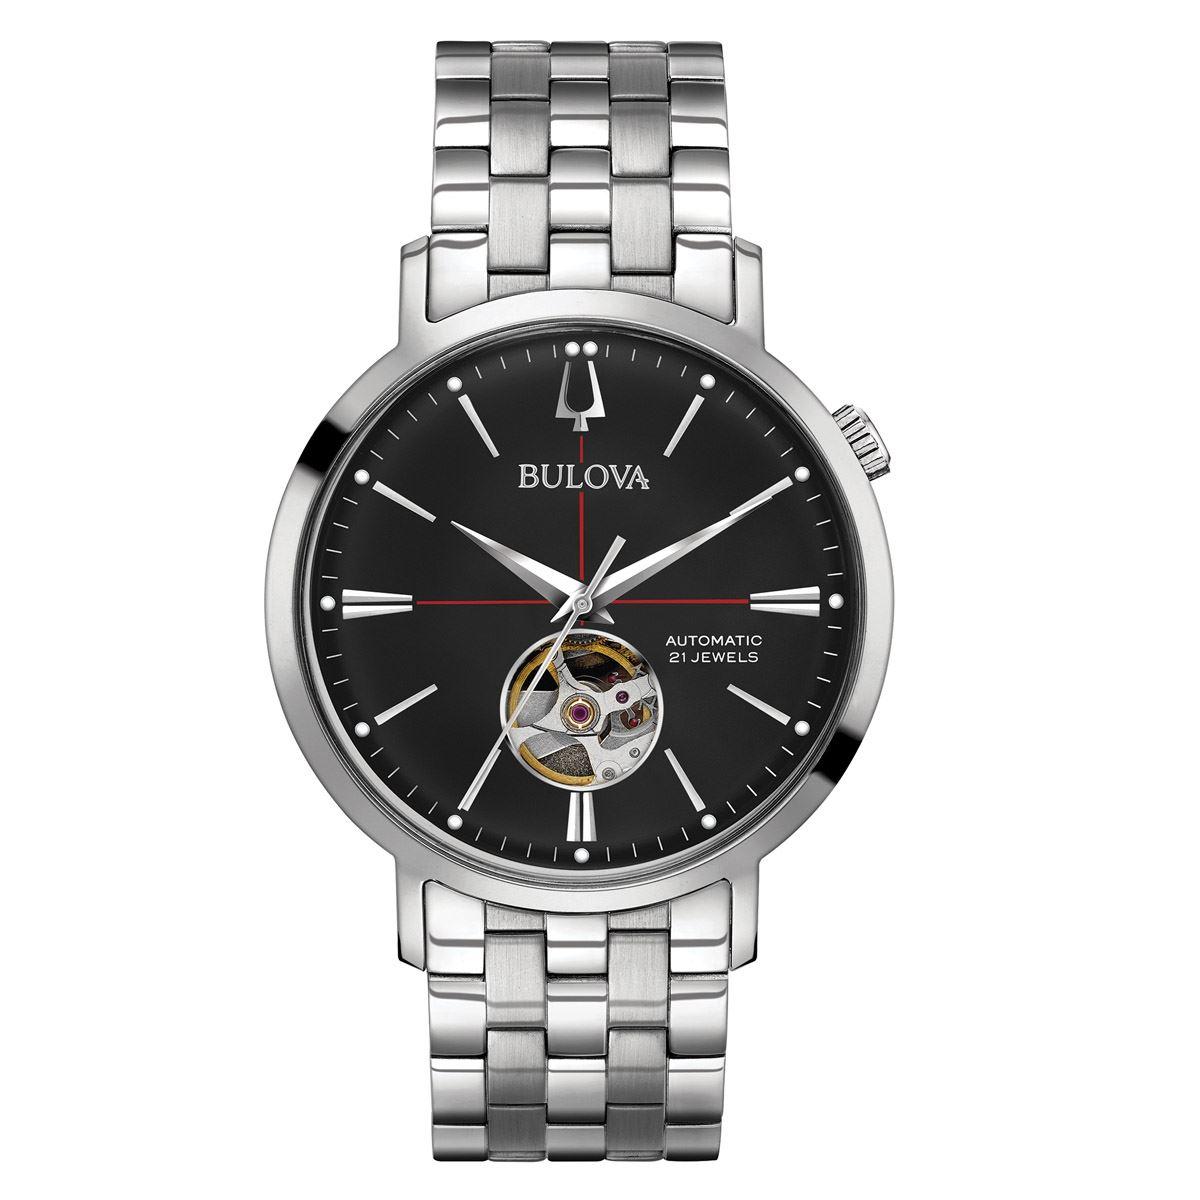 Reloj bulova para caballero  - Sanborns